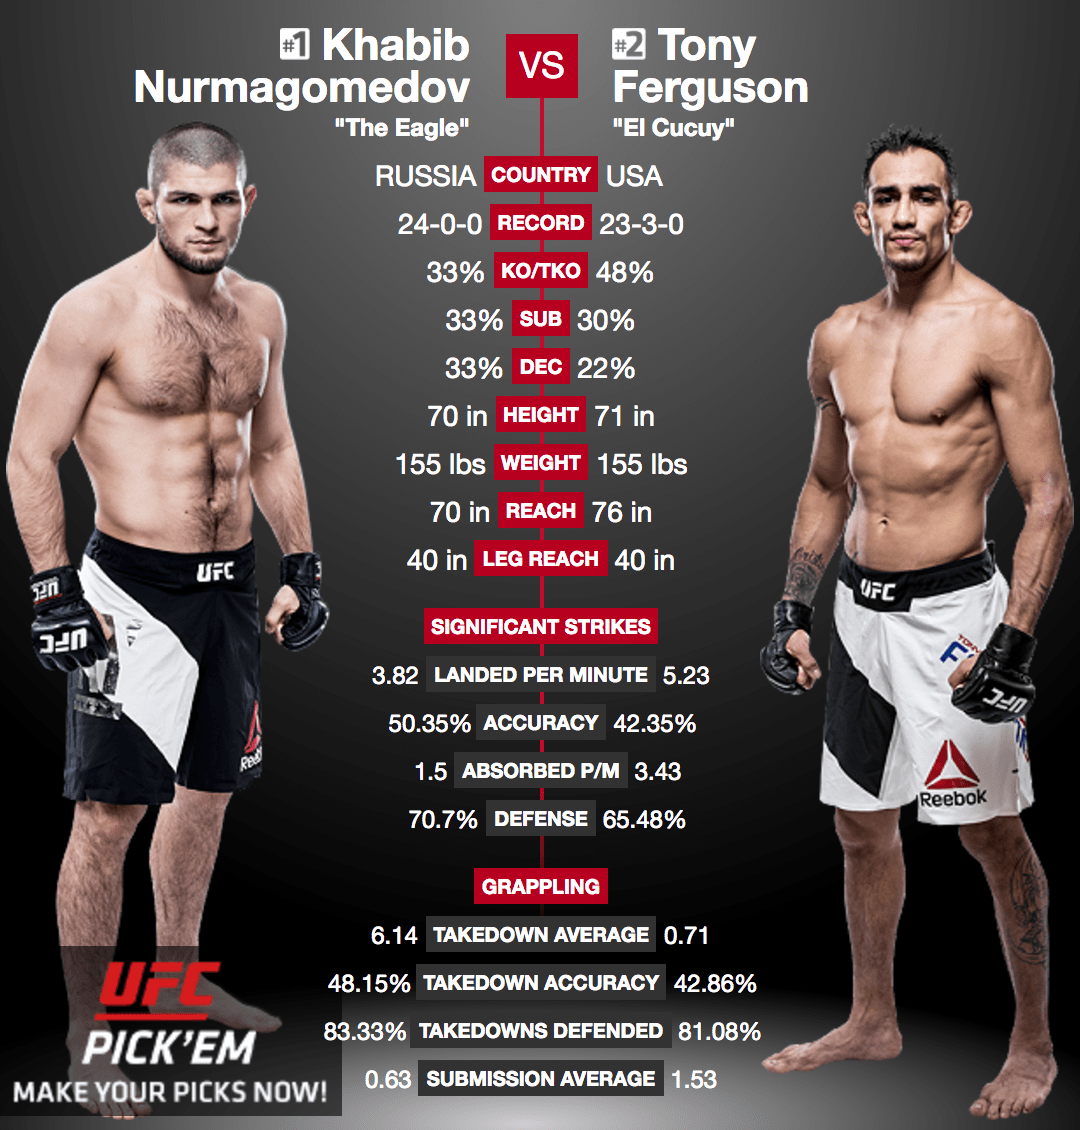 UFC 209 - Khabib Nurmagomedov et Tony Ferguson se chauffent